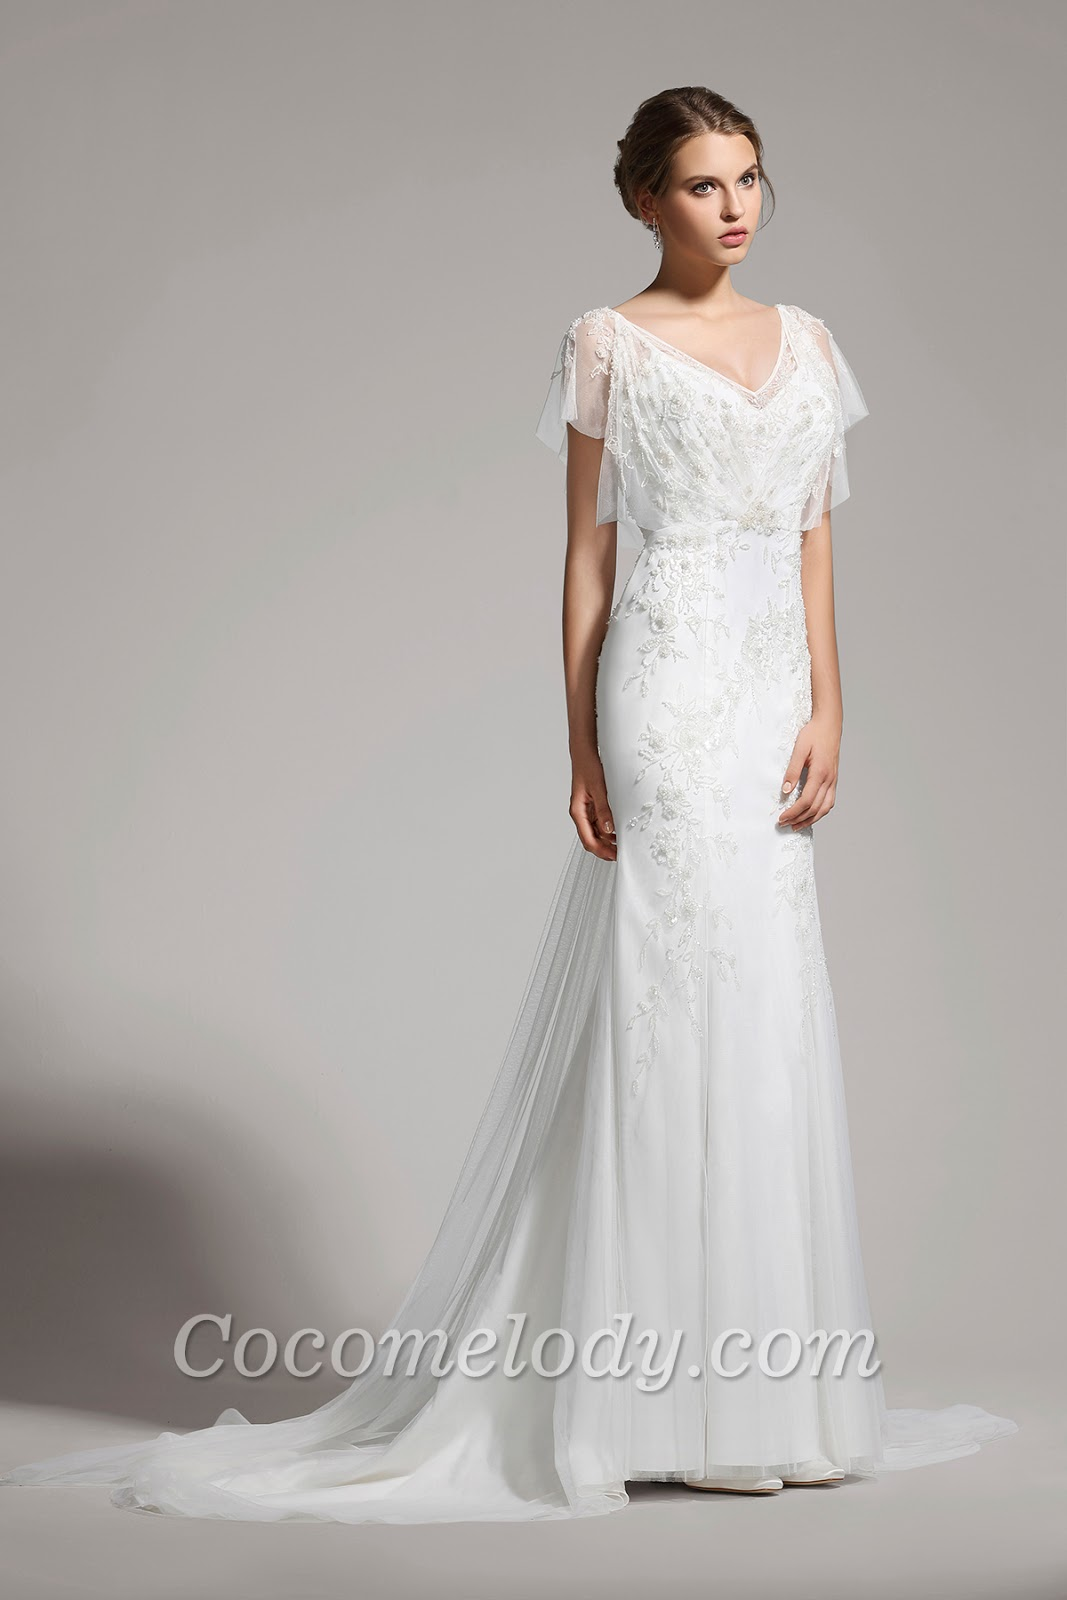 Wedding dress for country wedding